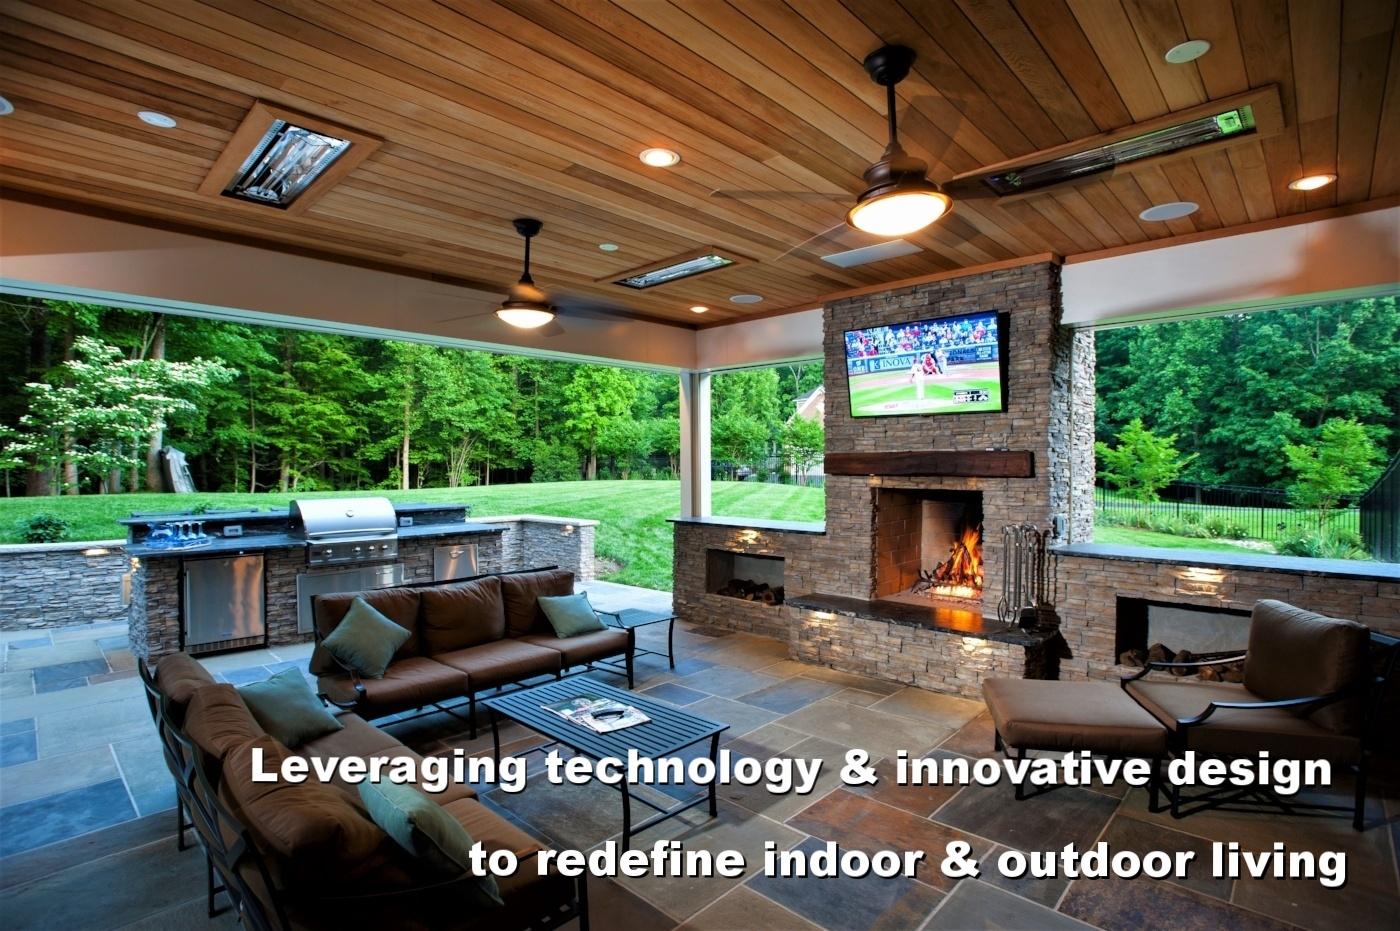 76 interior design jobs dc md va marvelous interior for Interior design employment agency